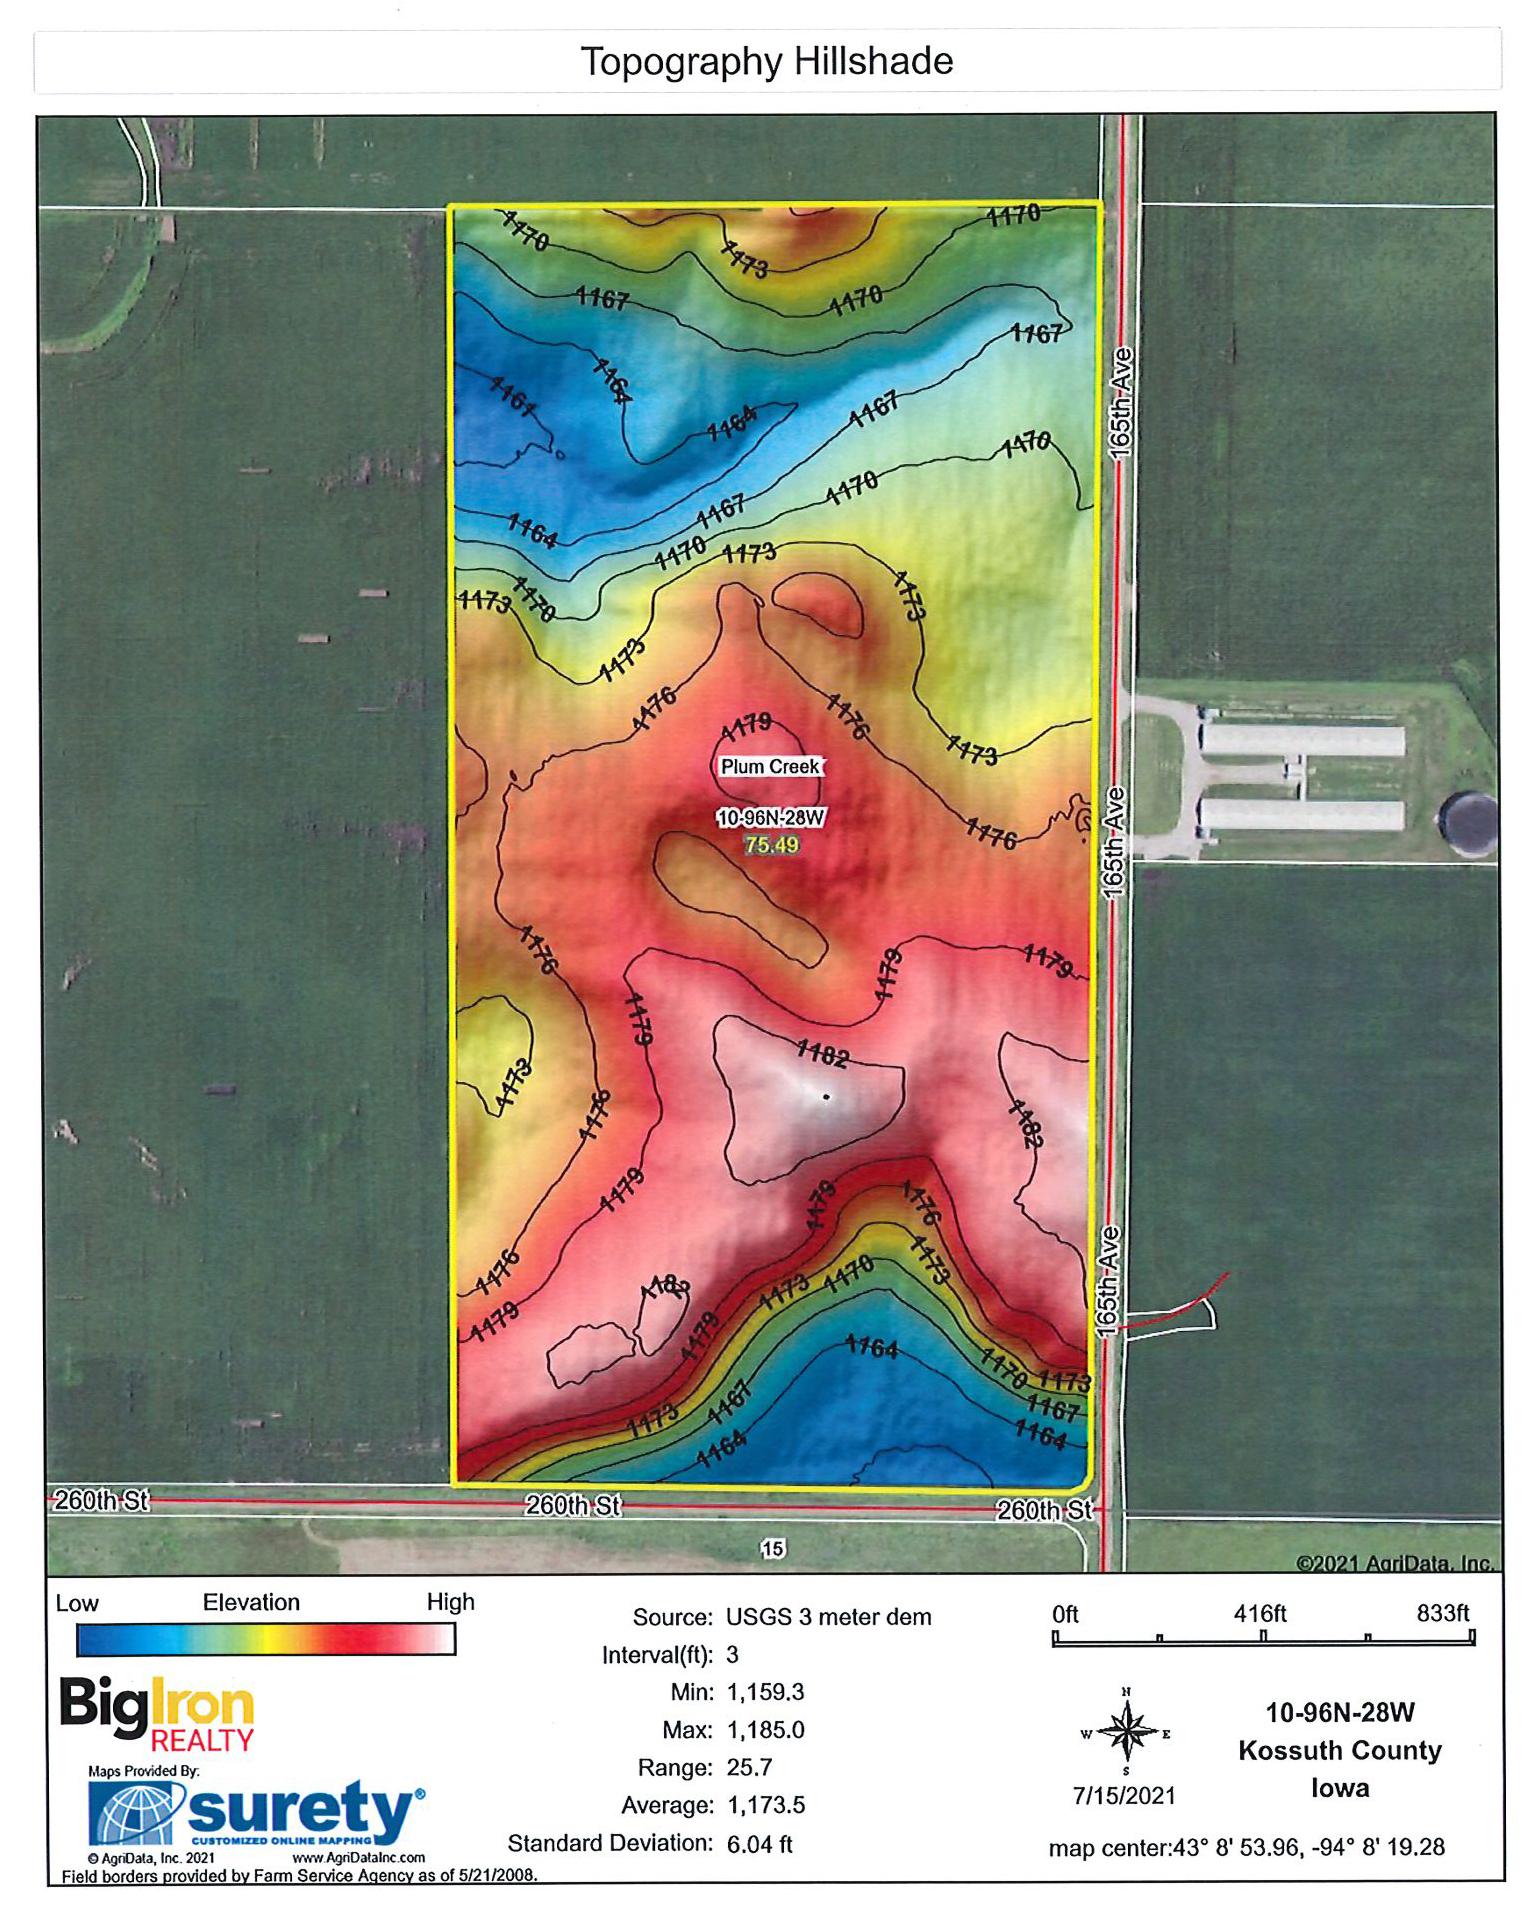 Topography Hillshade-BIR2138